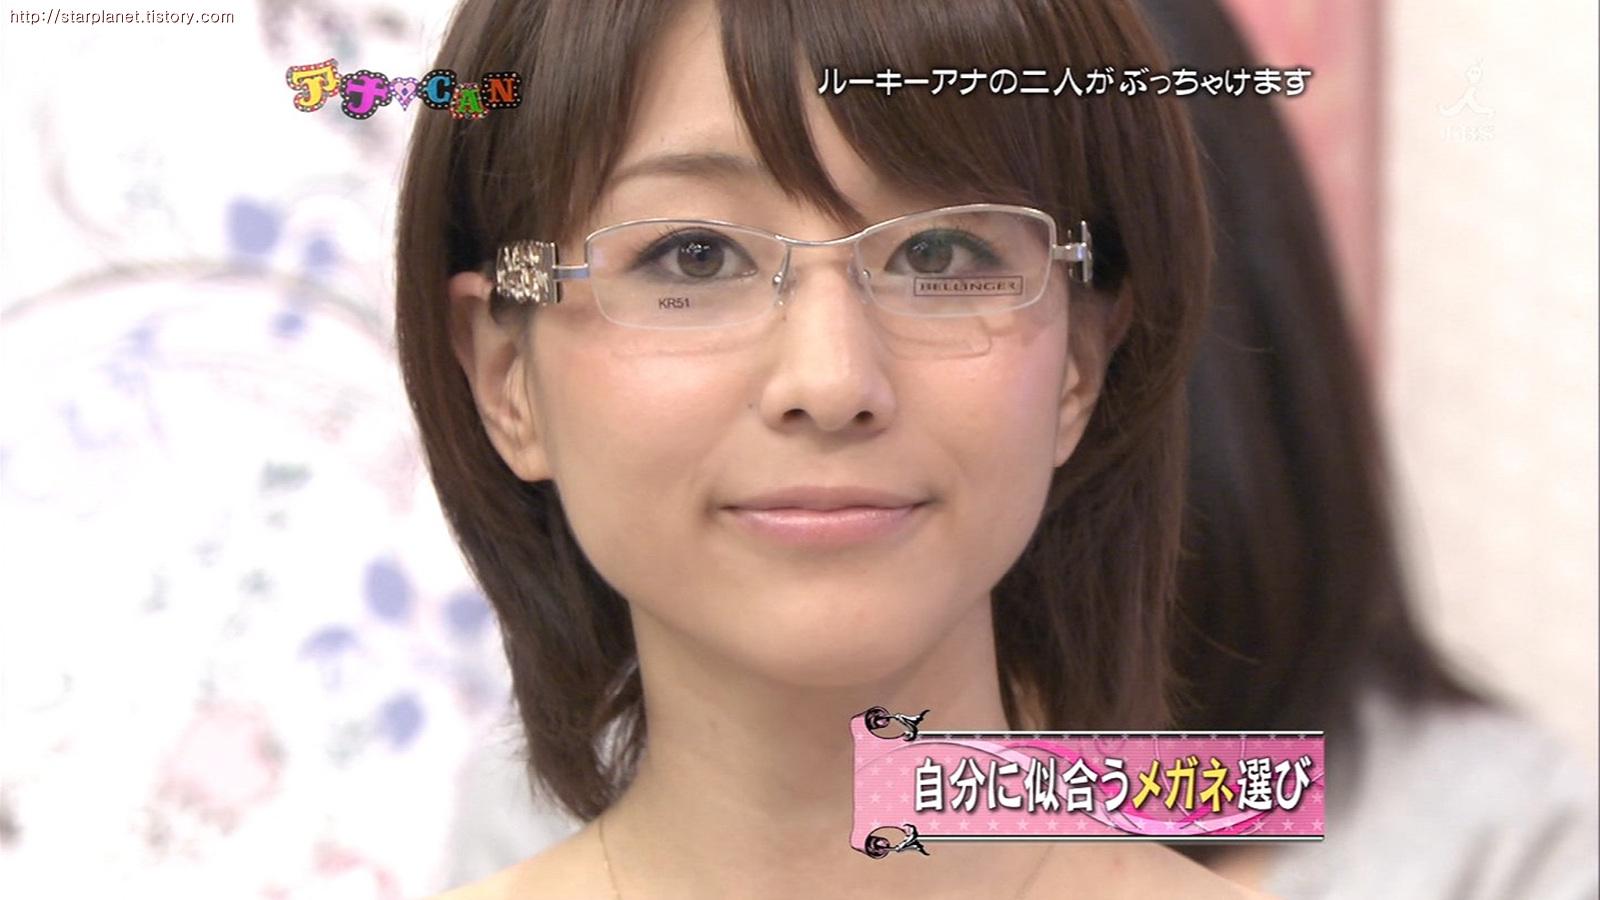 Tanaka Minami 스타플래닛